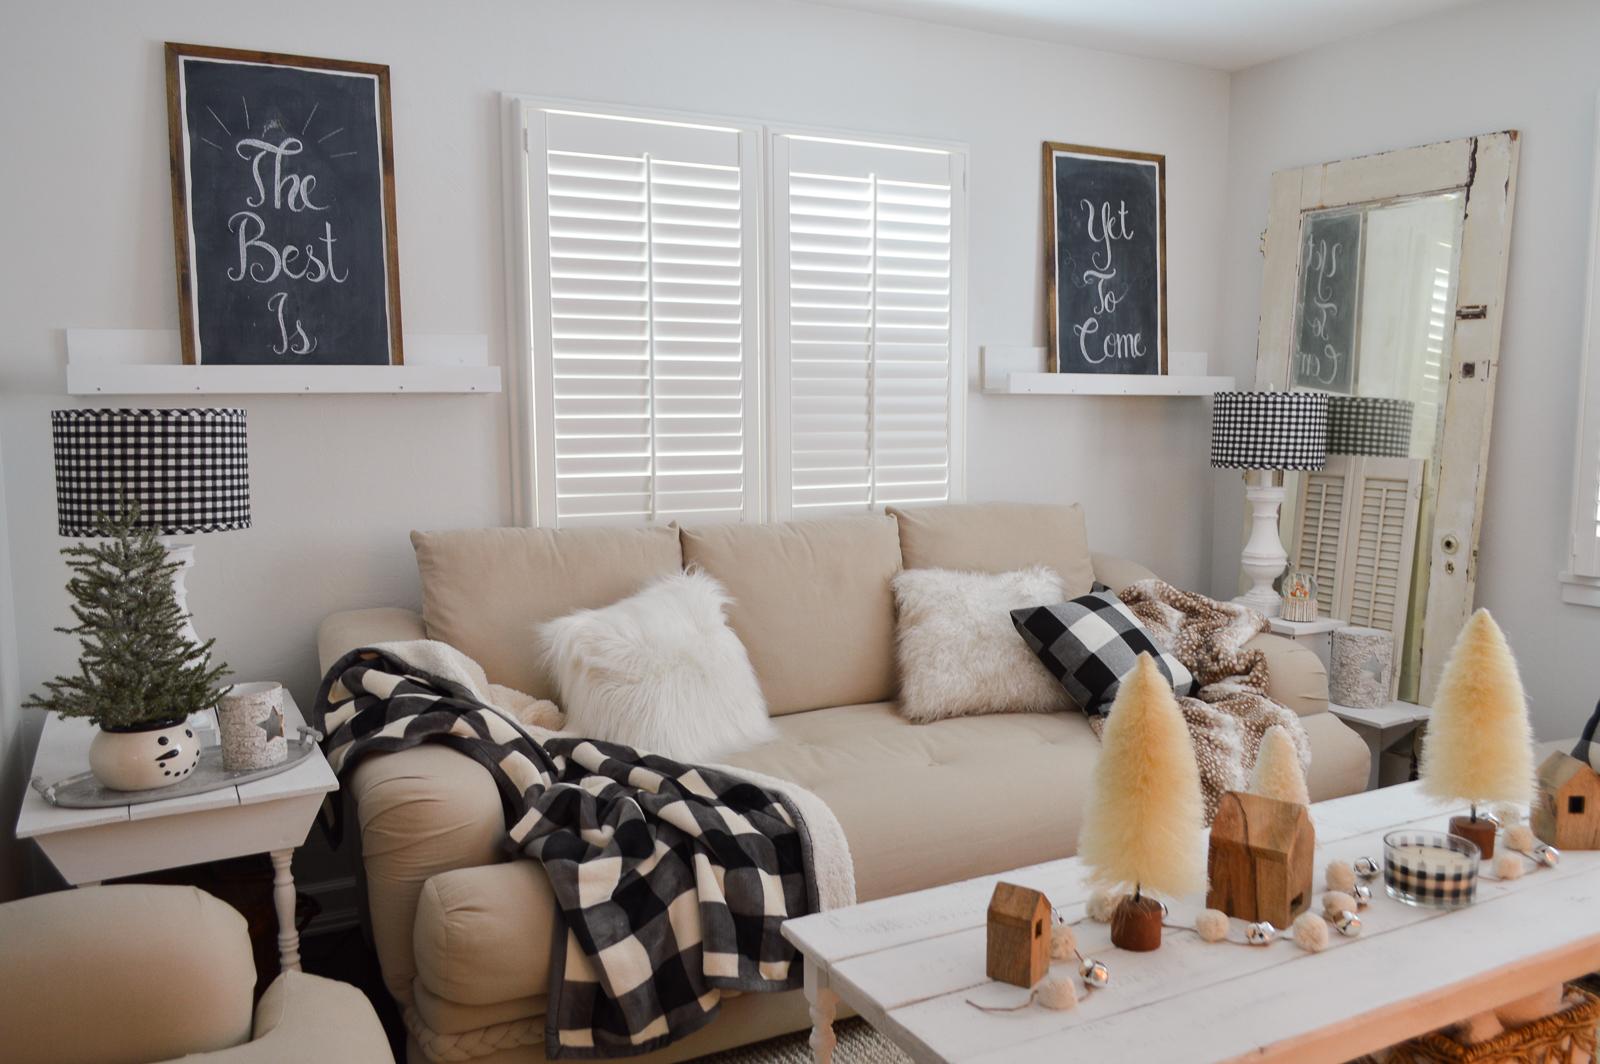 Cozy Cottage Winter Living Room Decorating Ideas - Fox ... on Room Decoration Ideas  id=20884